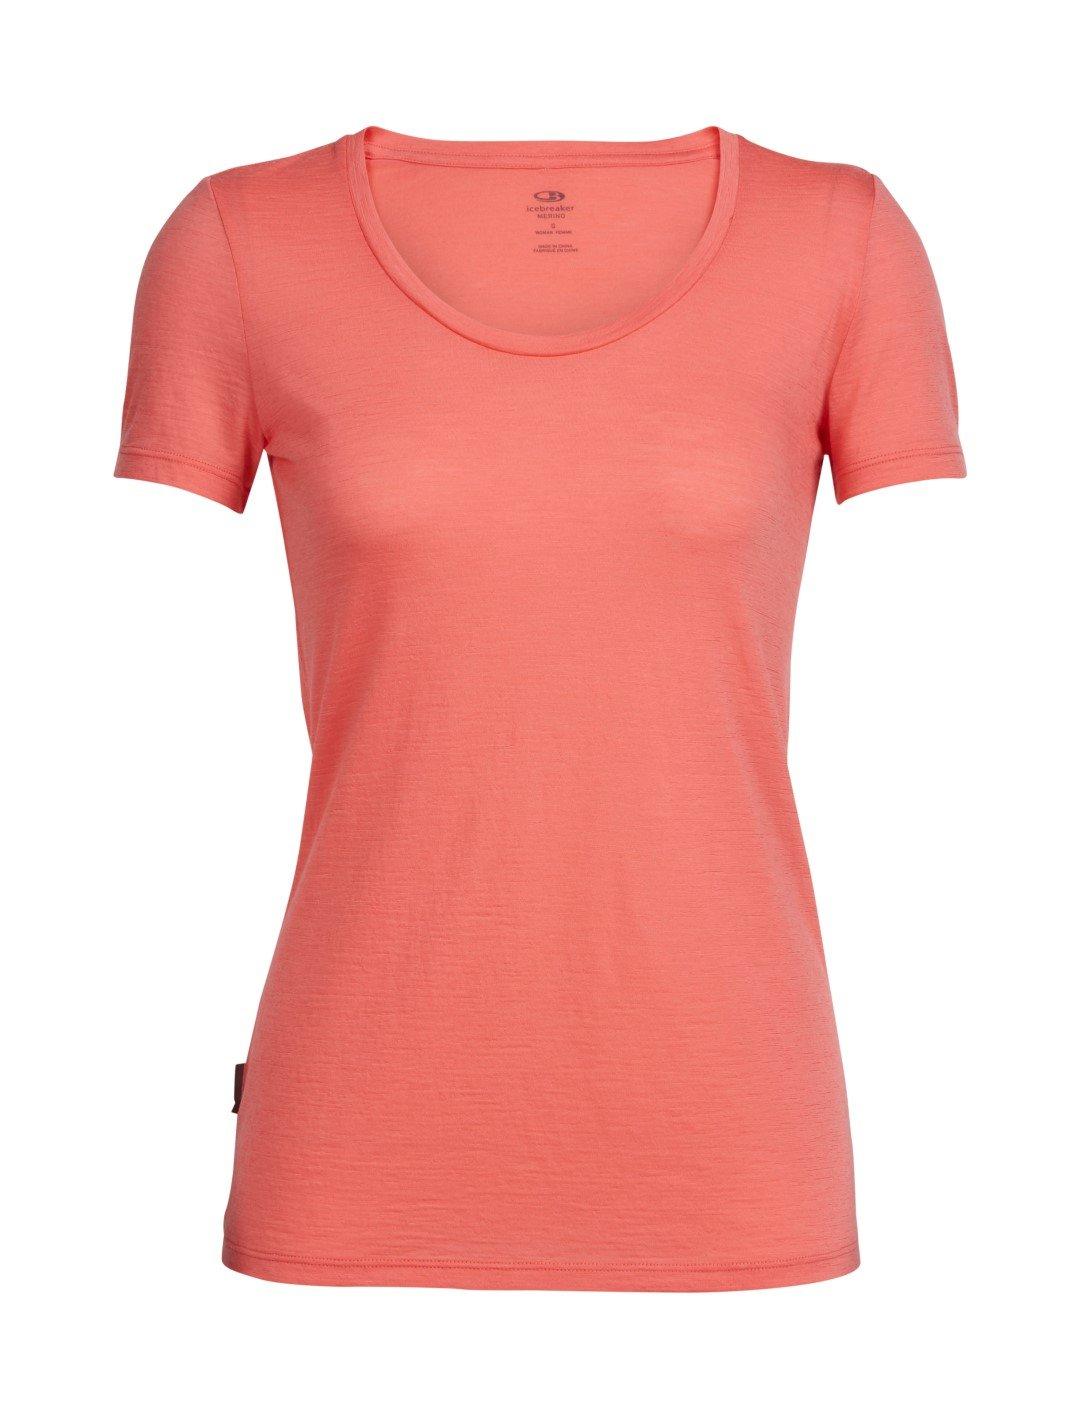 61lntZbuDJL - Icebreaker Women's Tech Lite Short Sleeve Scoop Short Sleeve First Layers